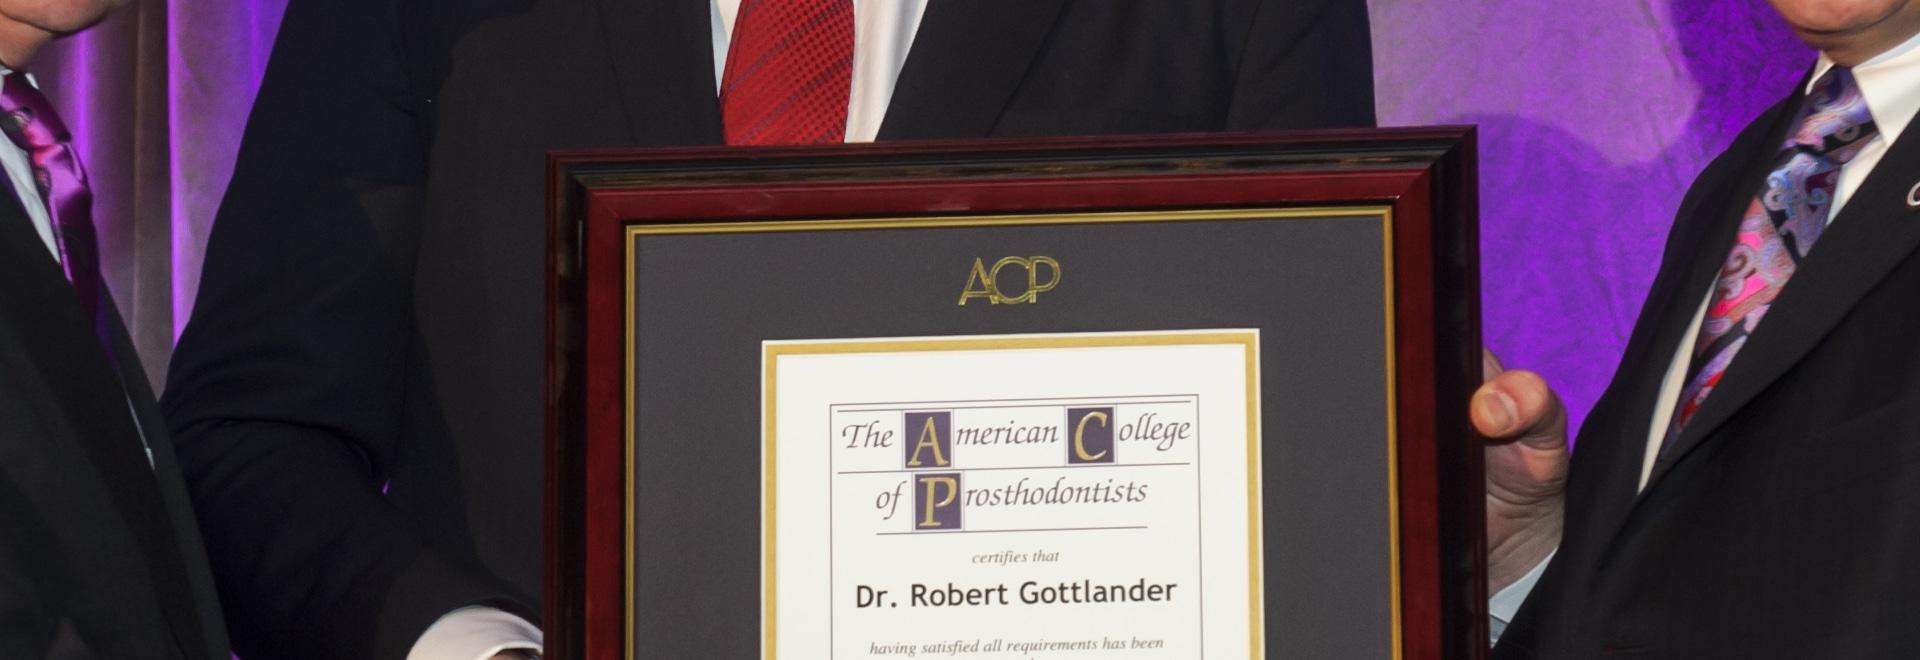 (Left to right): Dr. John Agar, Immediate Past President, American College of Prosthodontists (ACP); Dr. Robert Gottlander, VP of Global Prosthetic Solutions, Henry Schein, Inc. and Honorary Member...